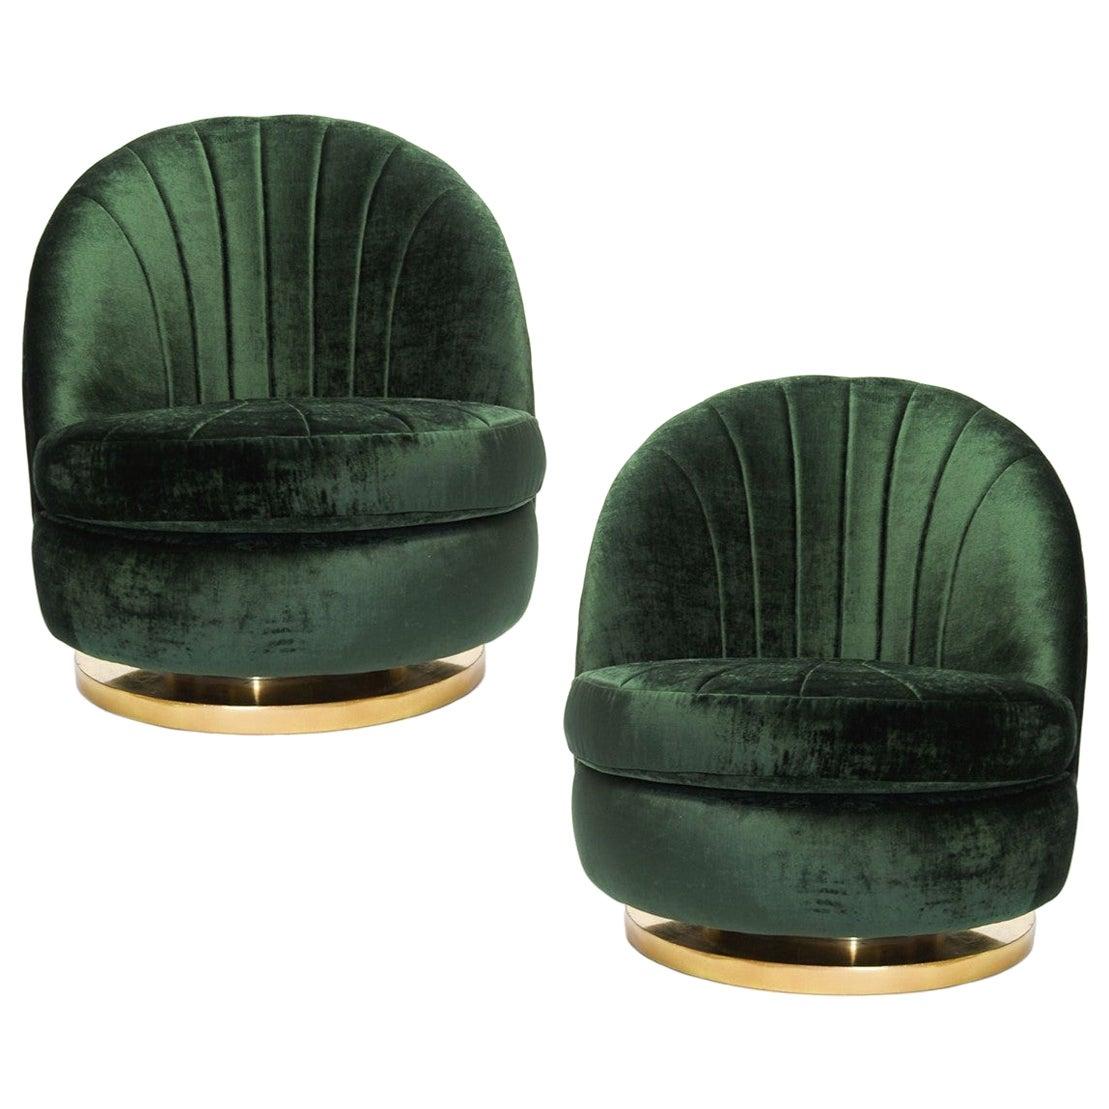 Gorgeous Pair of Green Milo Baughman Tilt and Swivel Lounge Brass Chairs